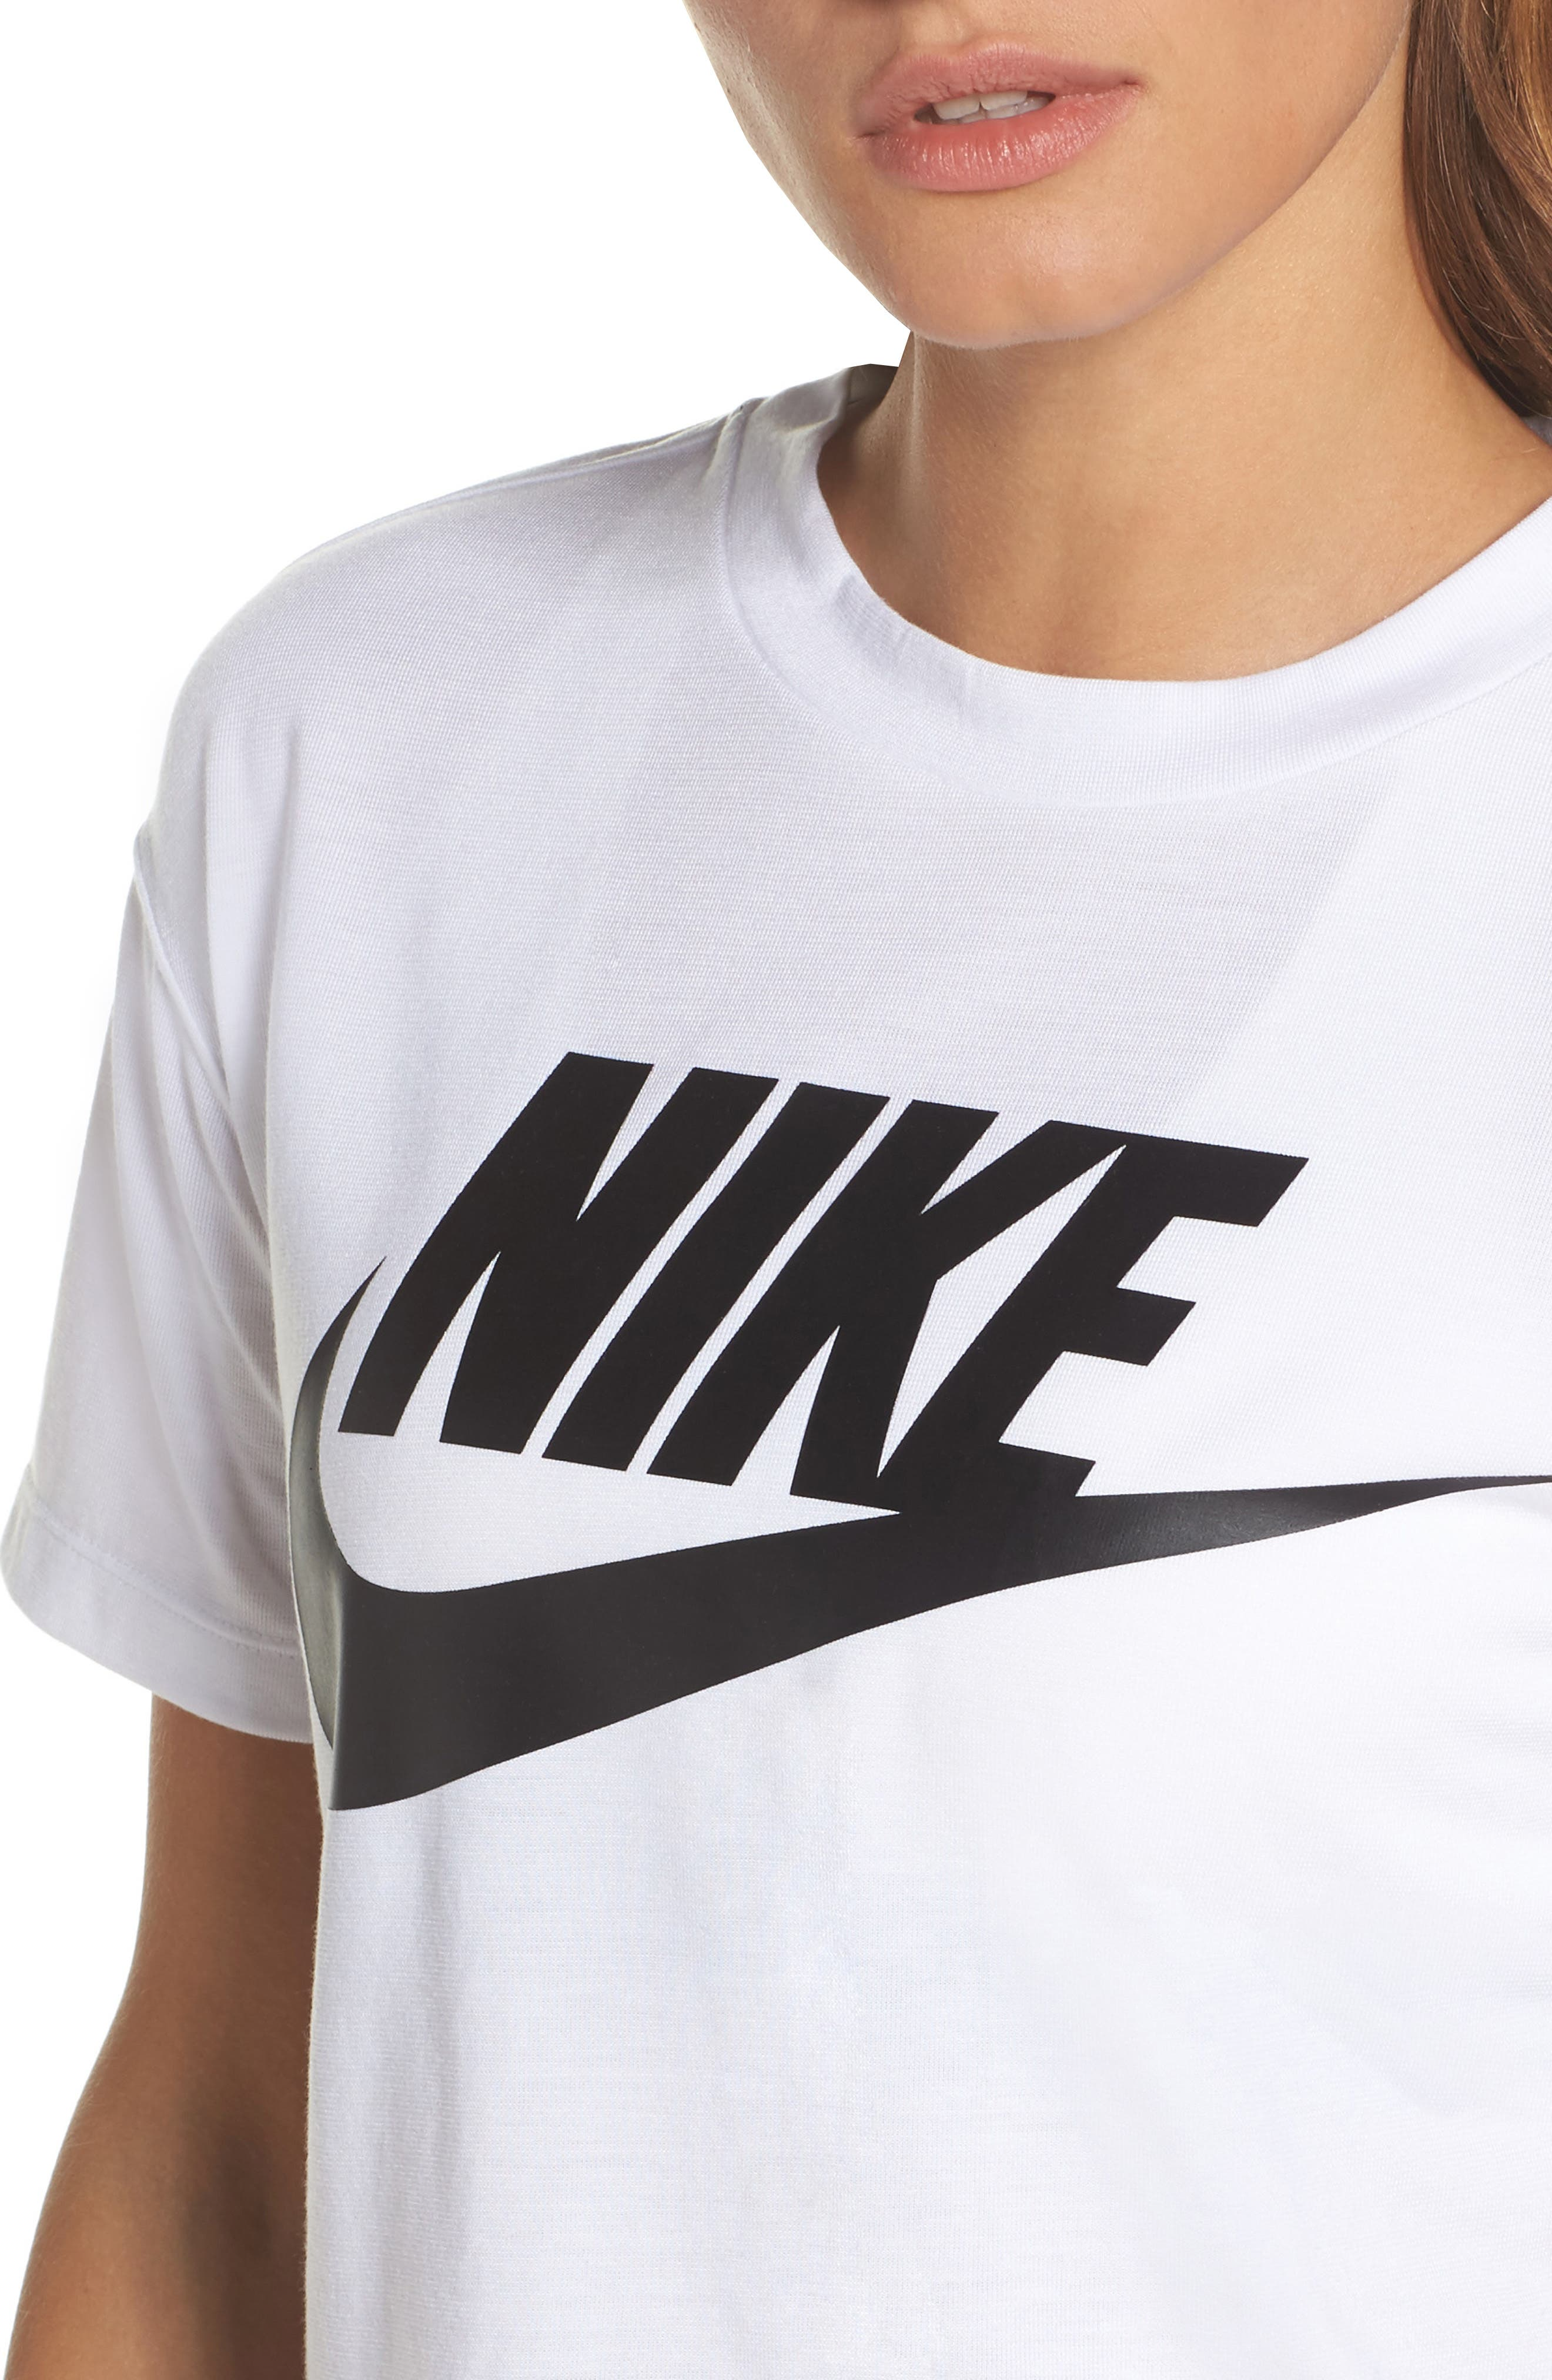 Sportswear Crop Top,                             Alternate thumbnail 4, color,                             WHITE/ BLACK